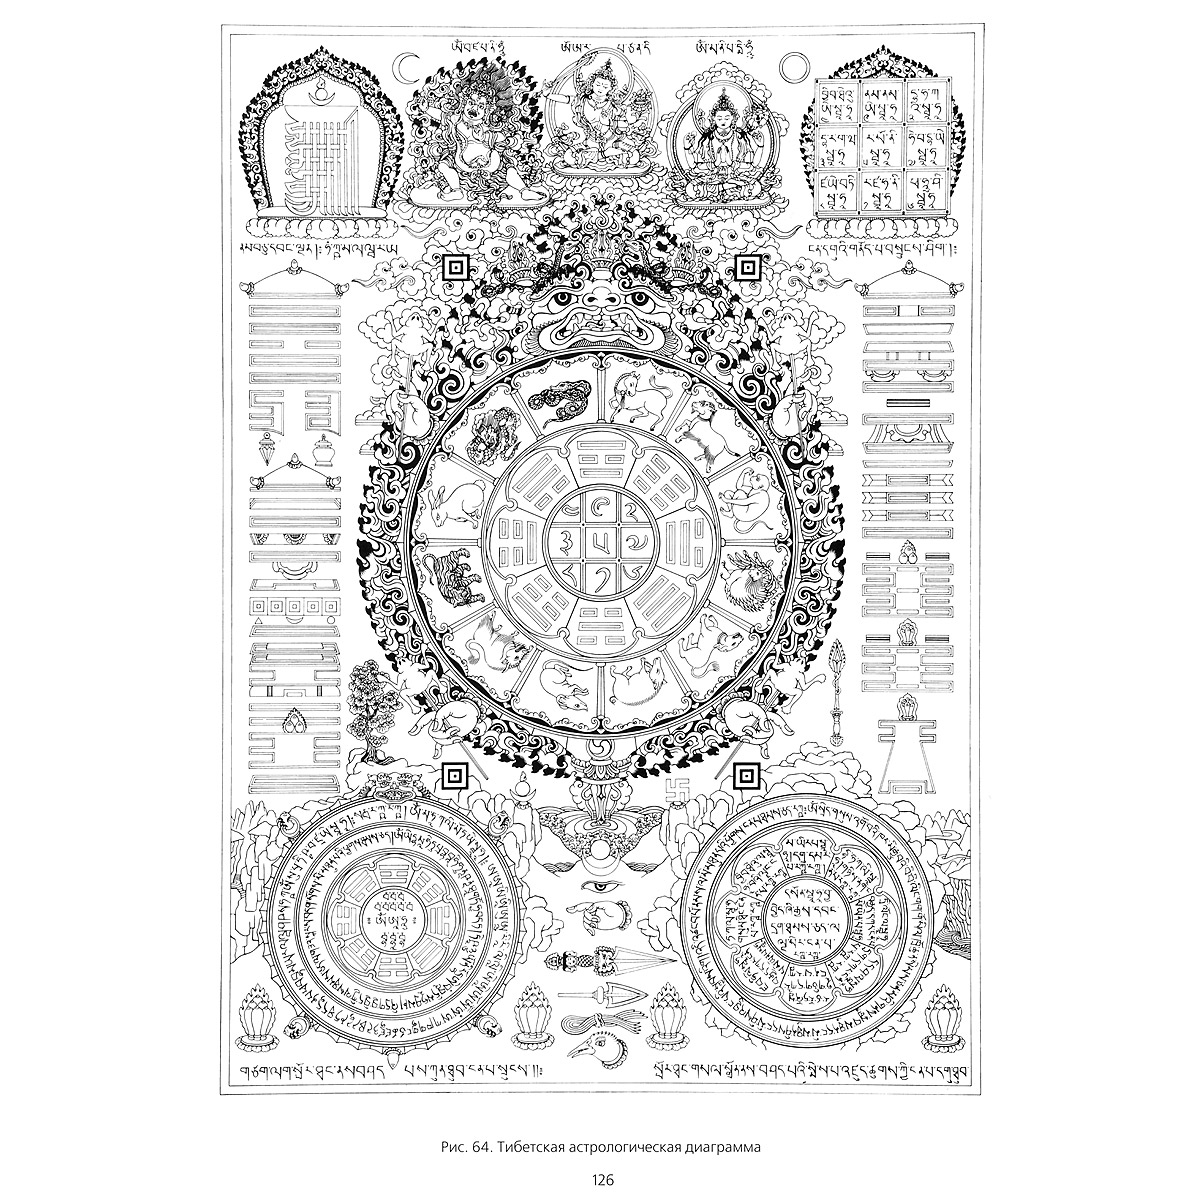 Тибетские символы и орнаменты. Энциклопедия, Роберт Бир